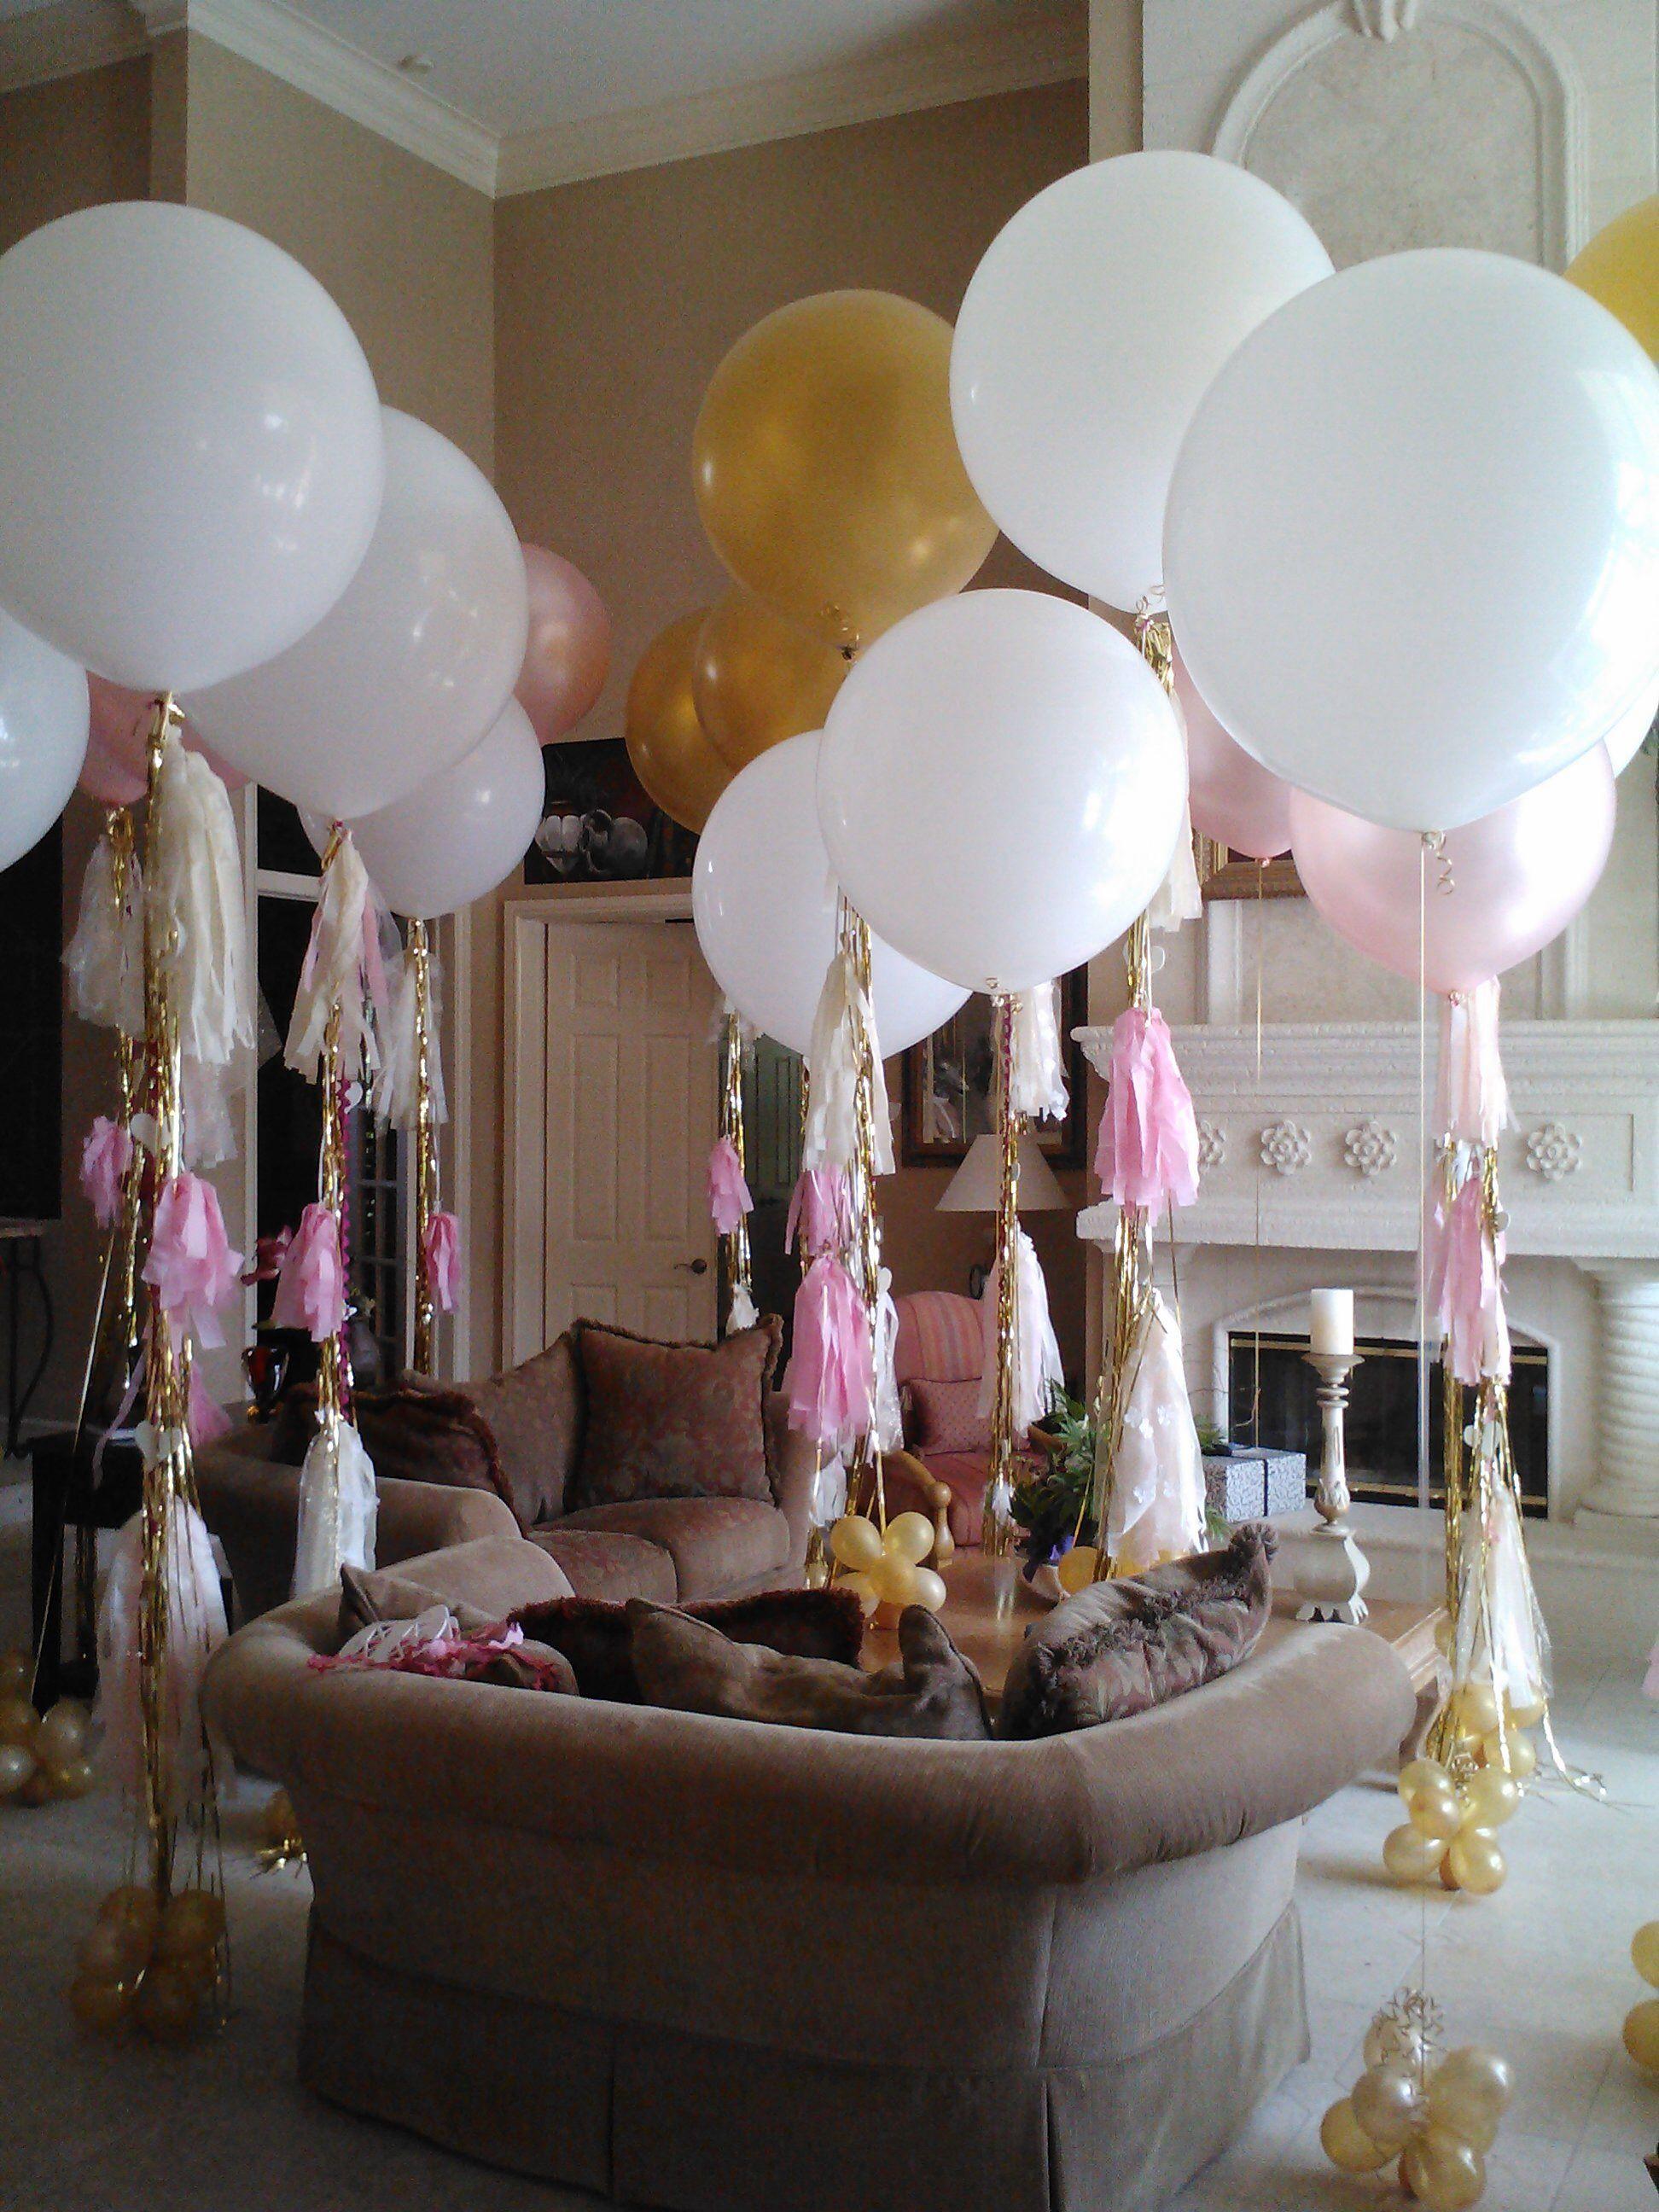 wwwPalmBeachBalloonscom Jumbo helium balloon decorating Admirals